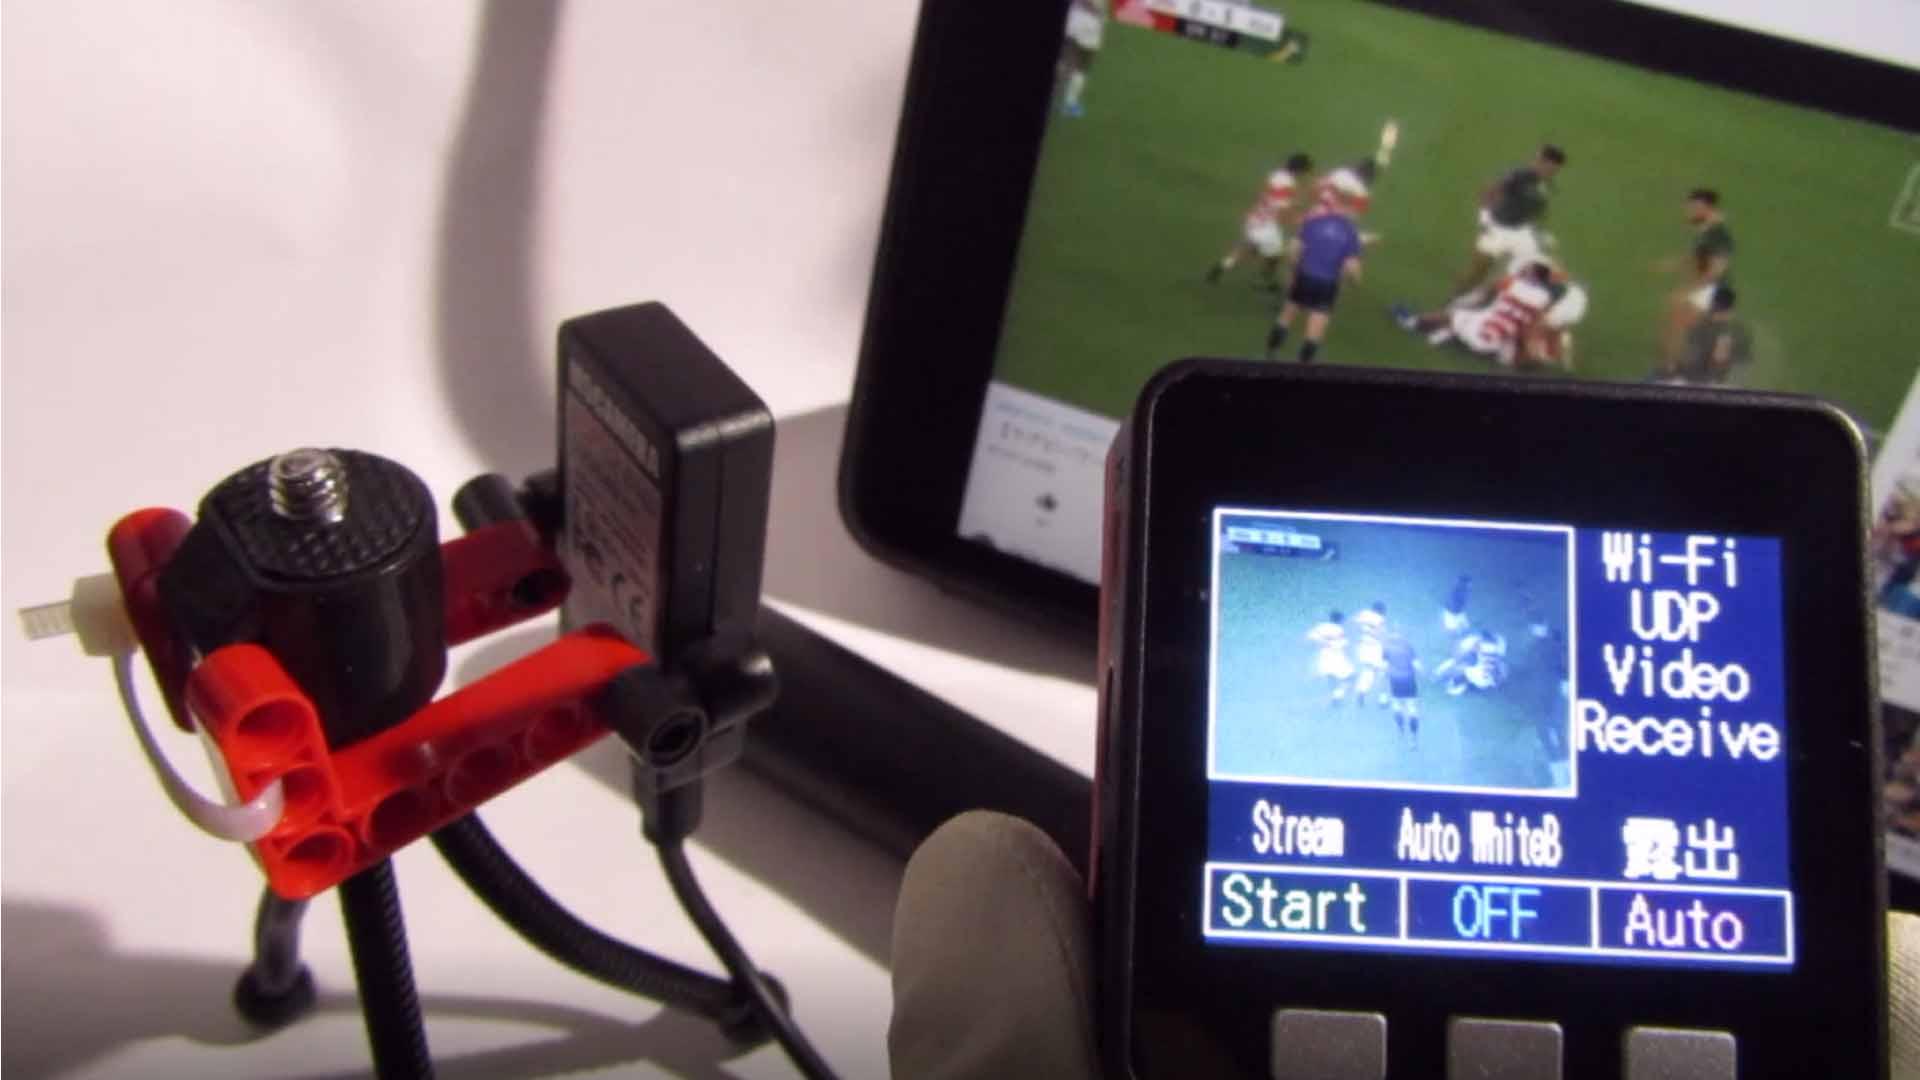 M5Cameraの動画をM5StackへWiFi, UDPで送信する実験